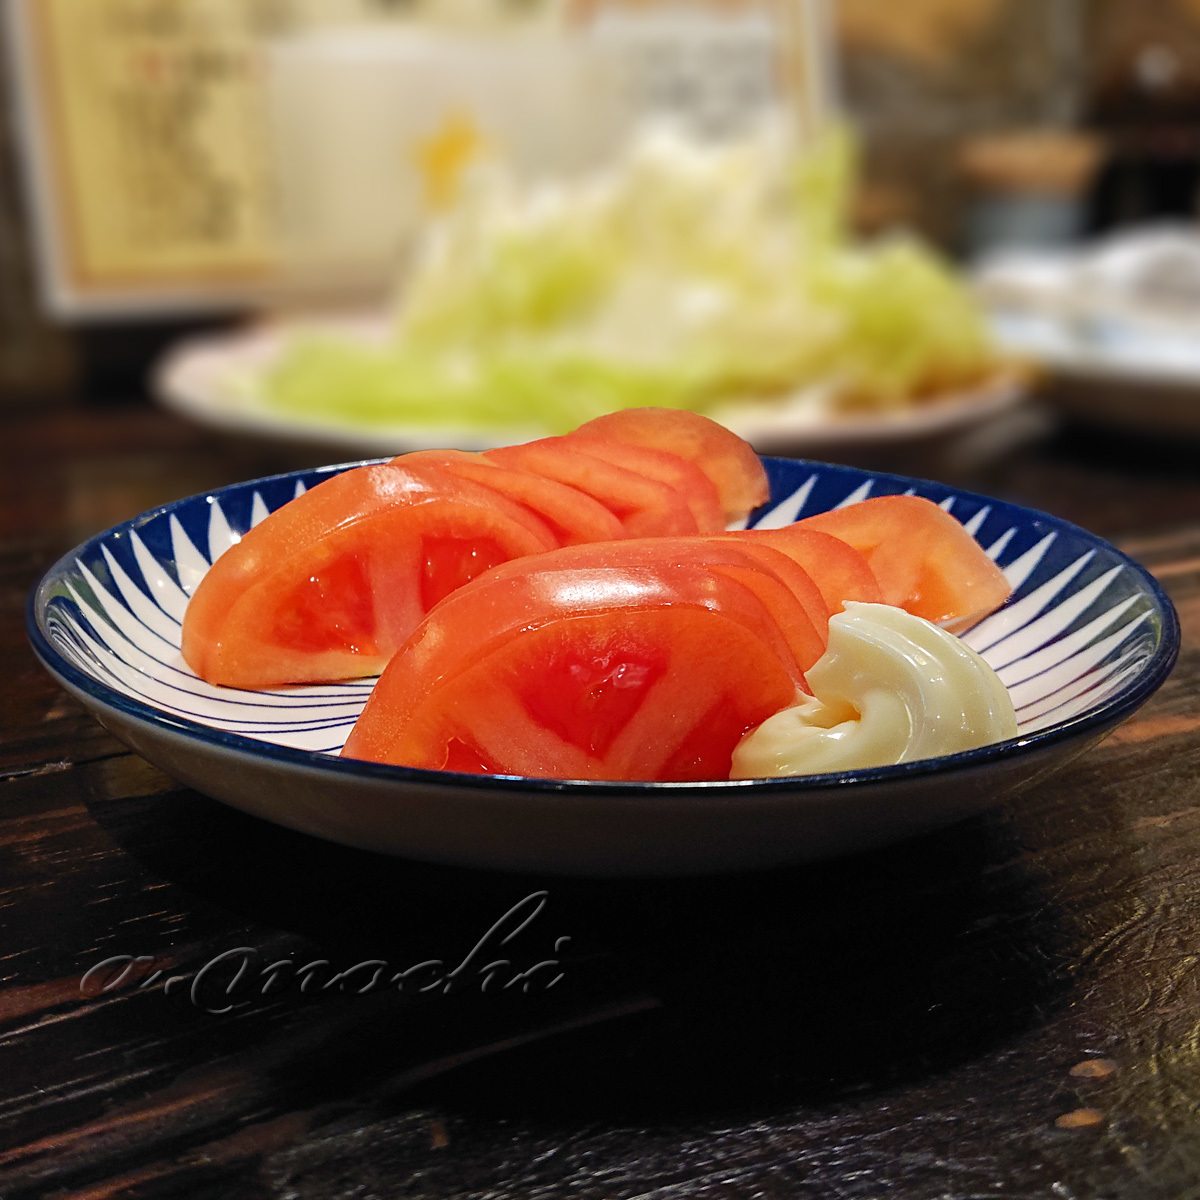 8_sabuchan_tomatos.jpg